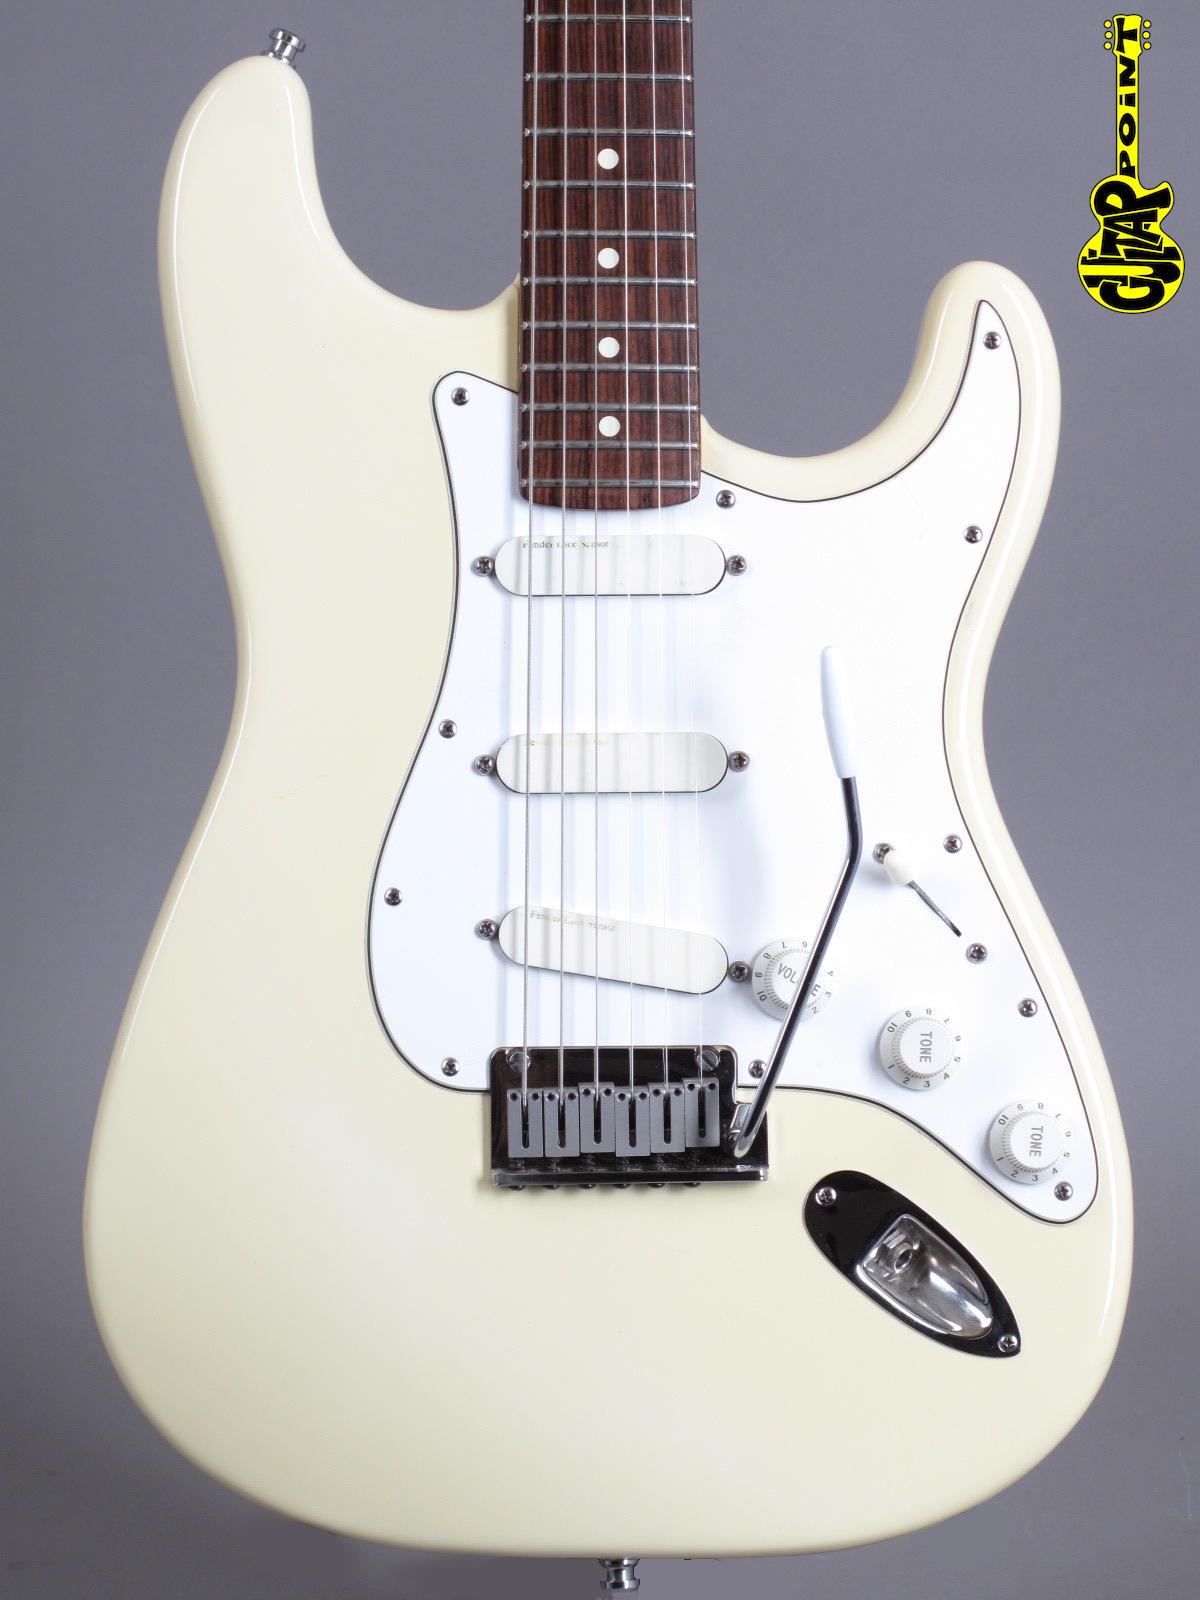 1988 Fender Stratocaster Plus - Arctic White